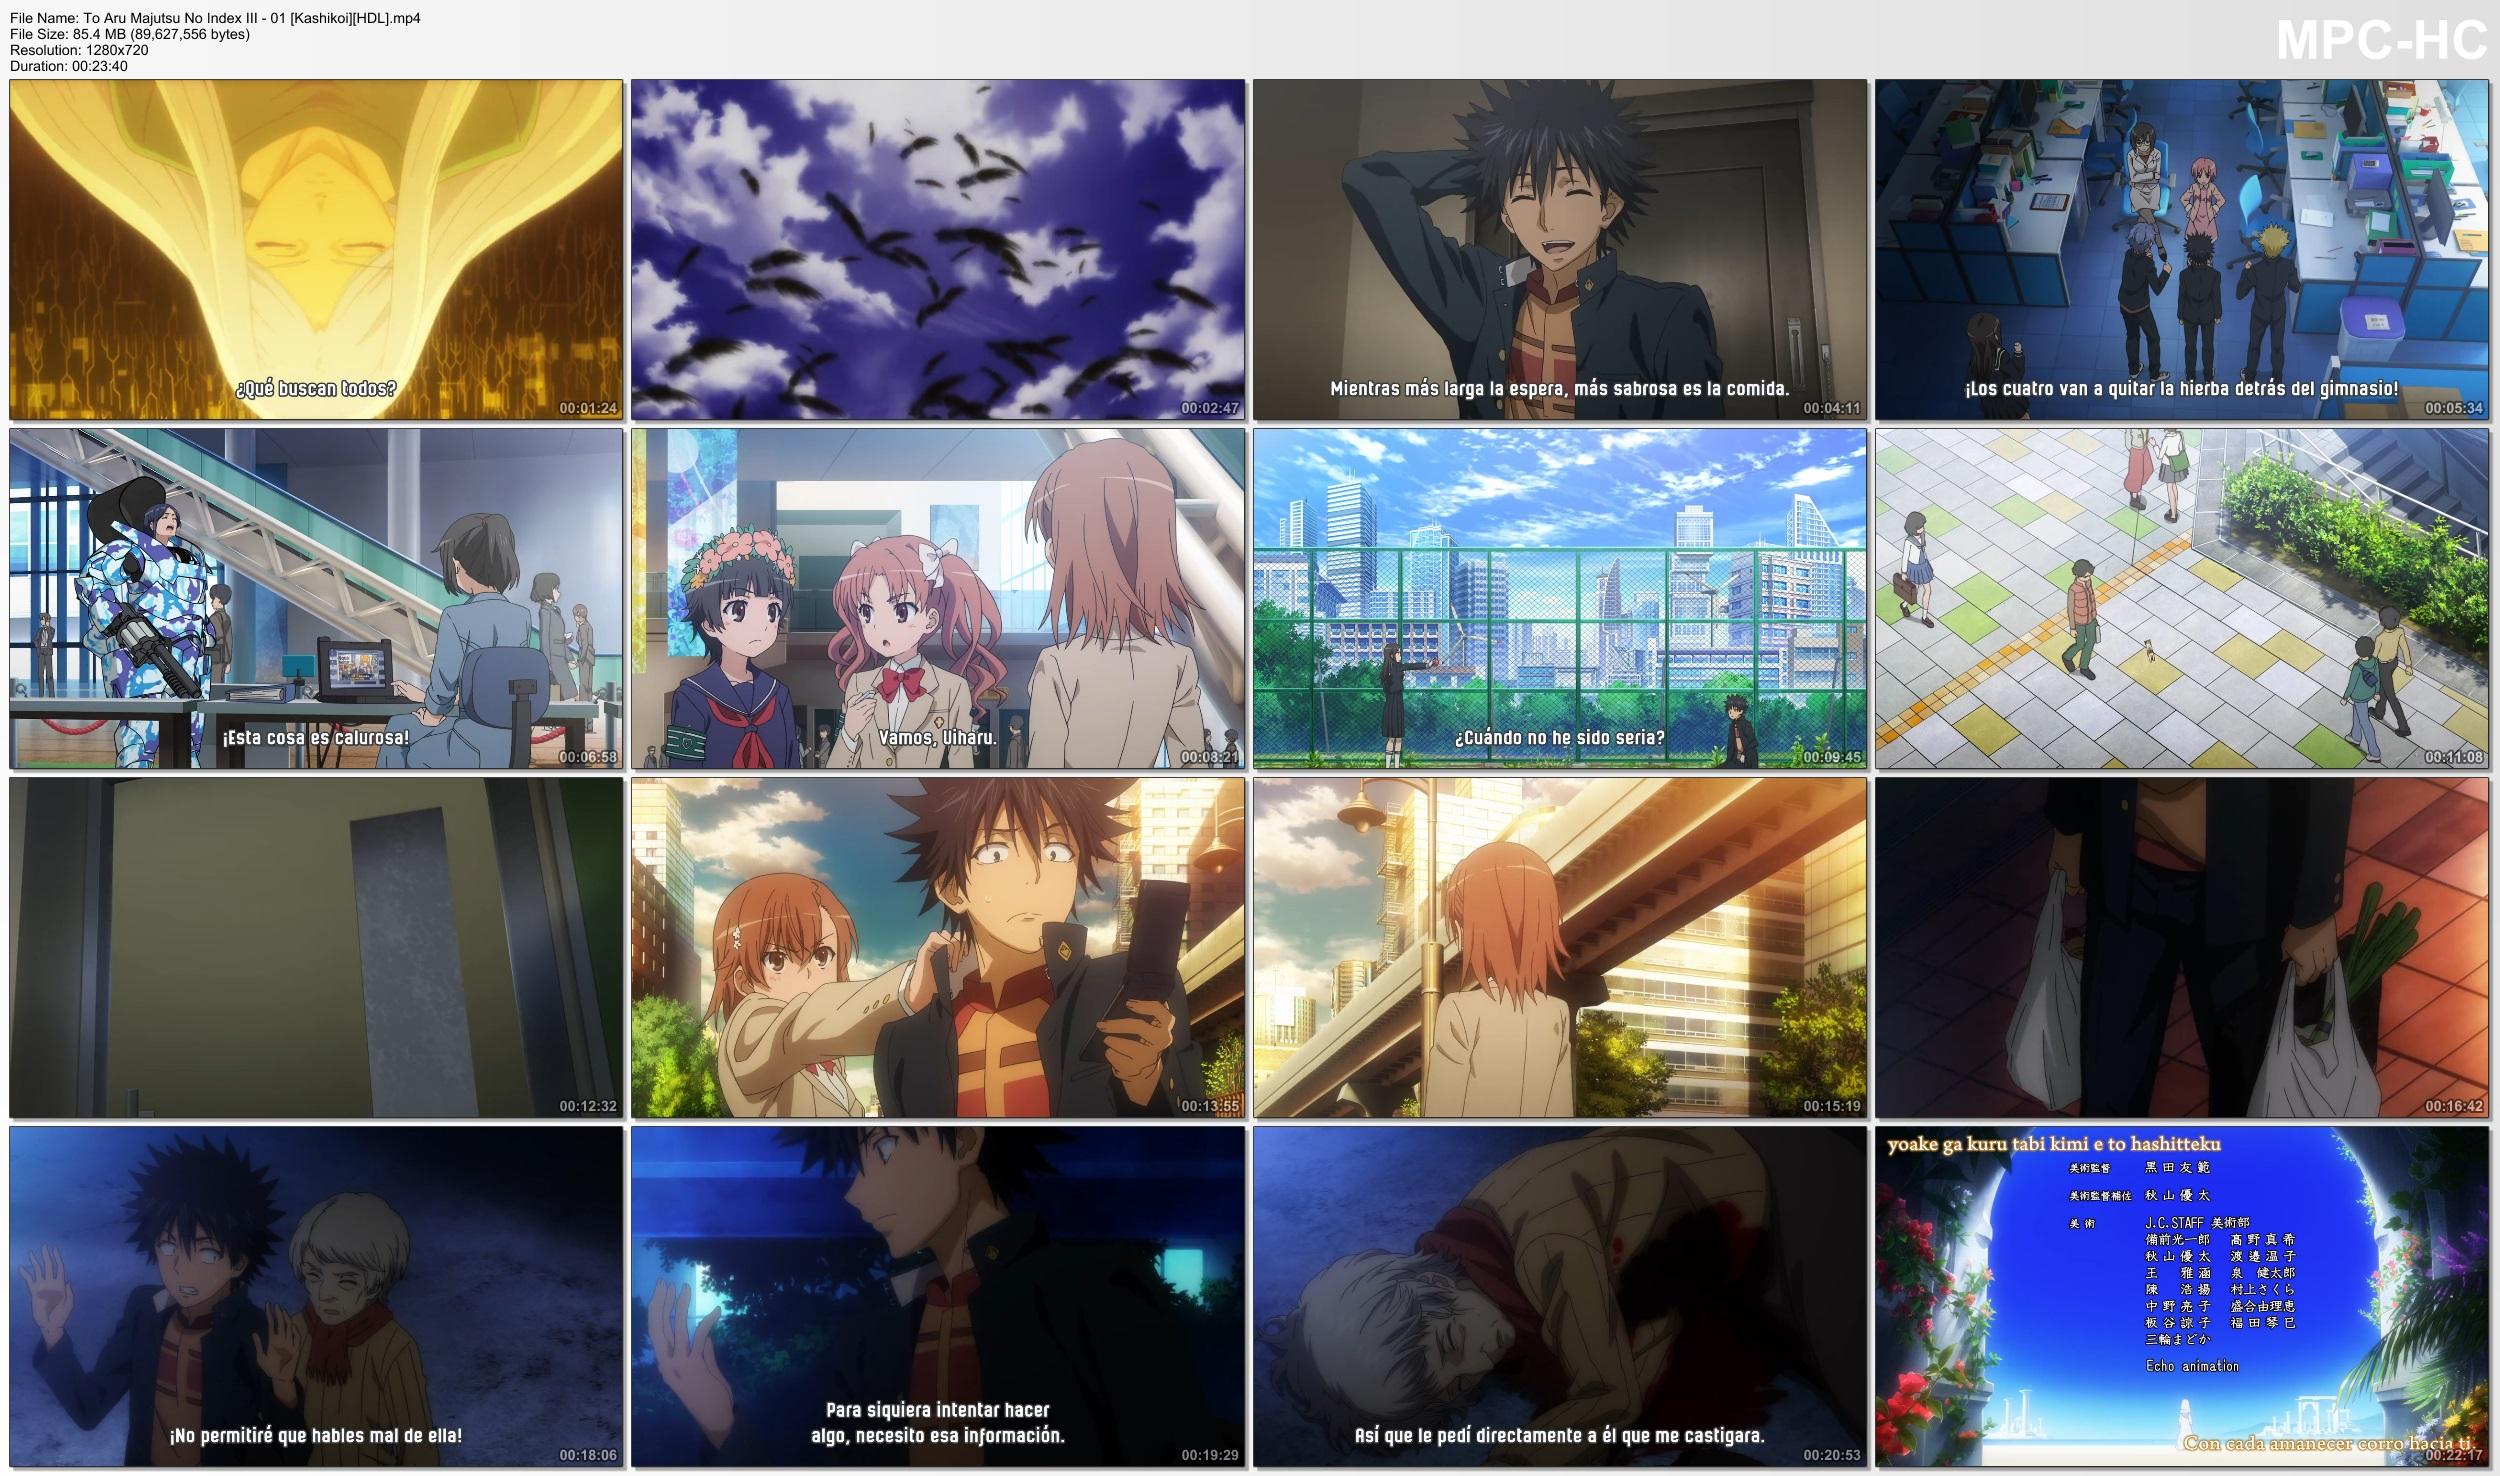 PrYAG77eg2PrZ - [Aporte] Toaru Majutsu no Index III [26/26][85MB][Kashikoi][MEGA][Concluido] - Anime Ligero [Descargas]